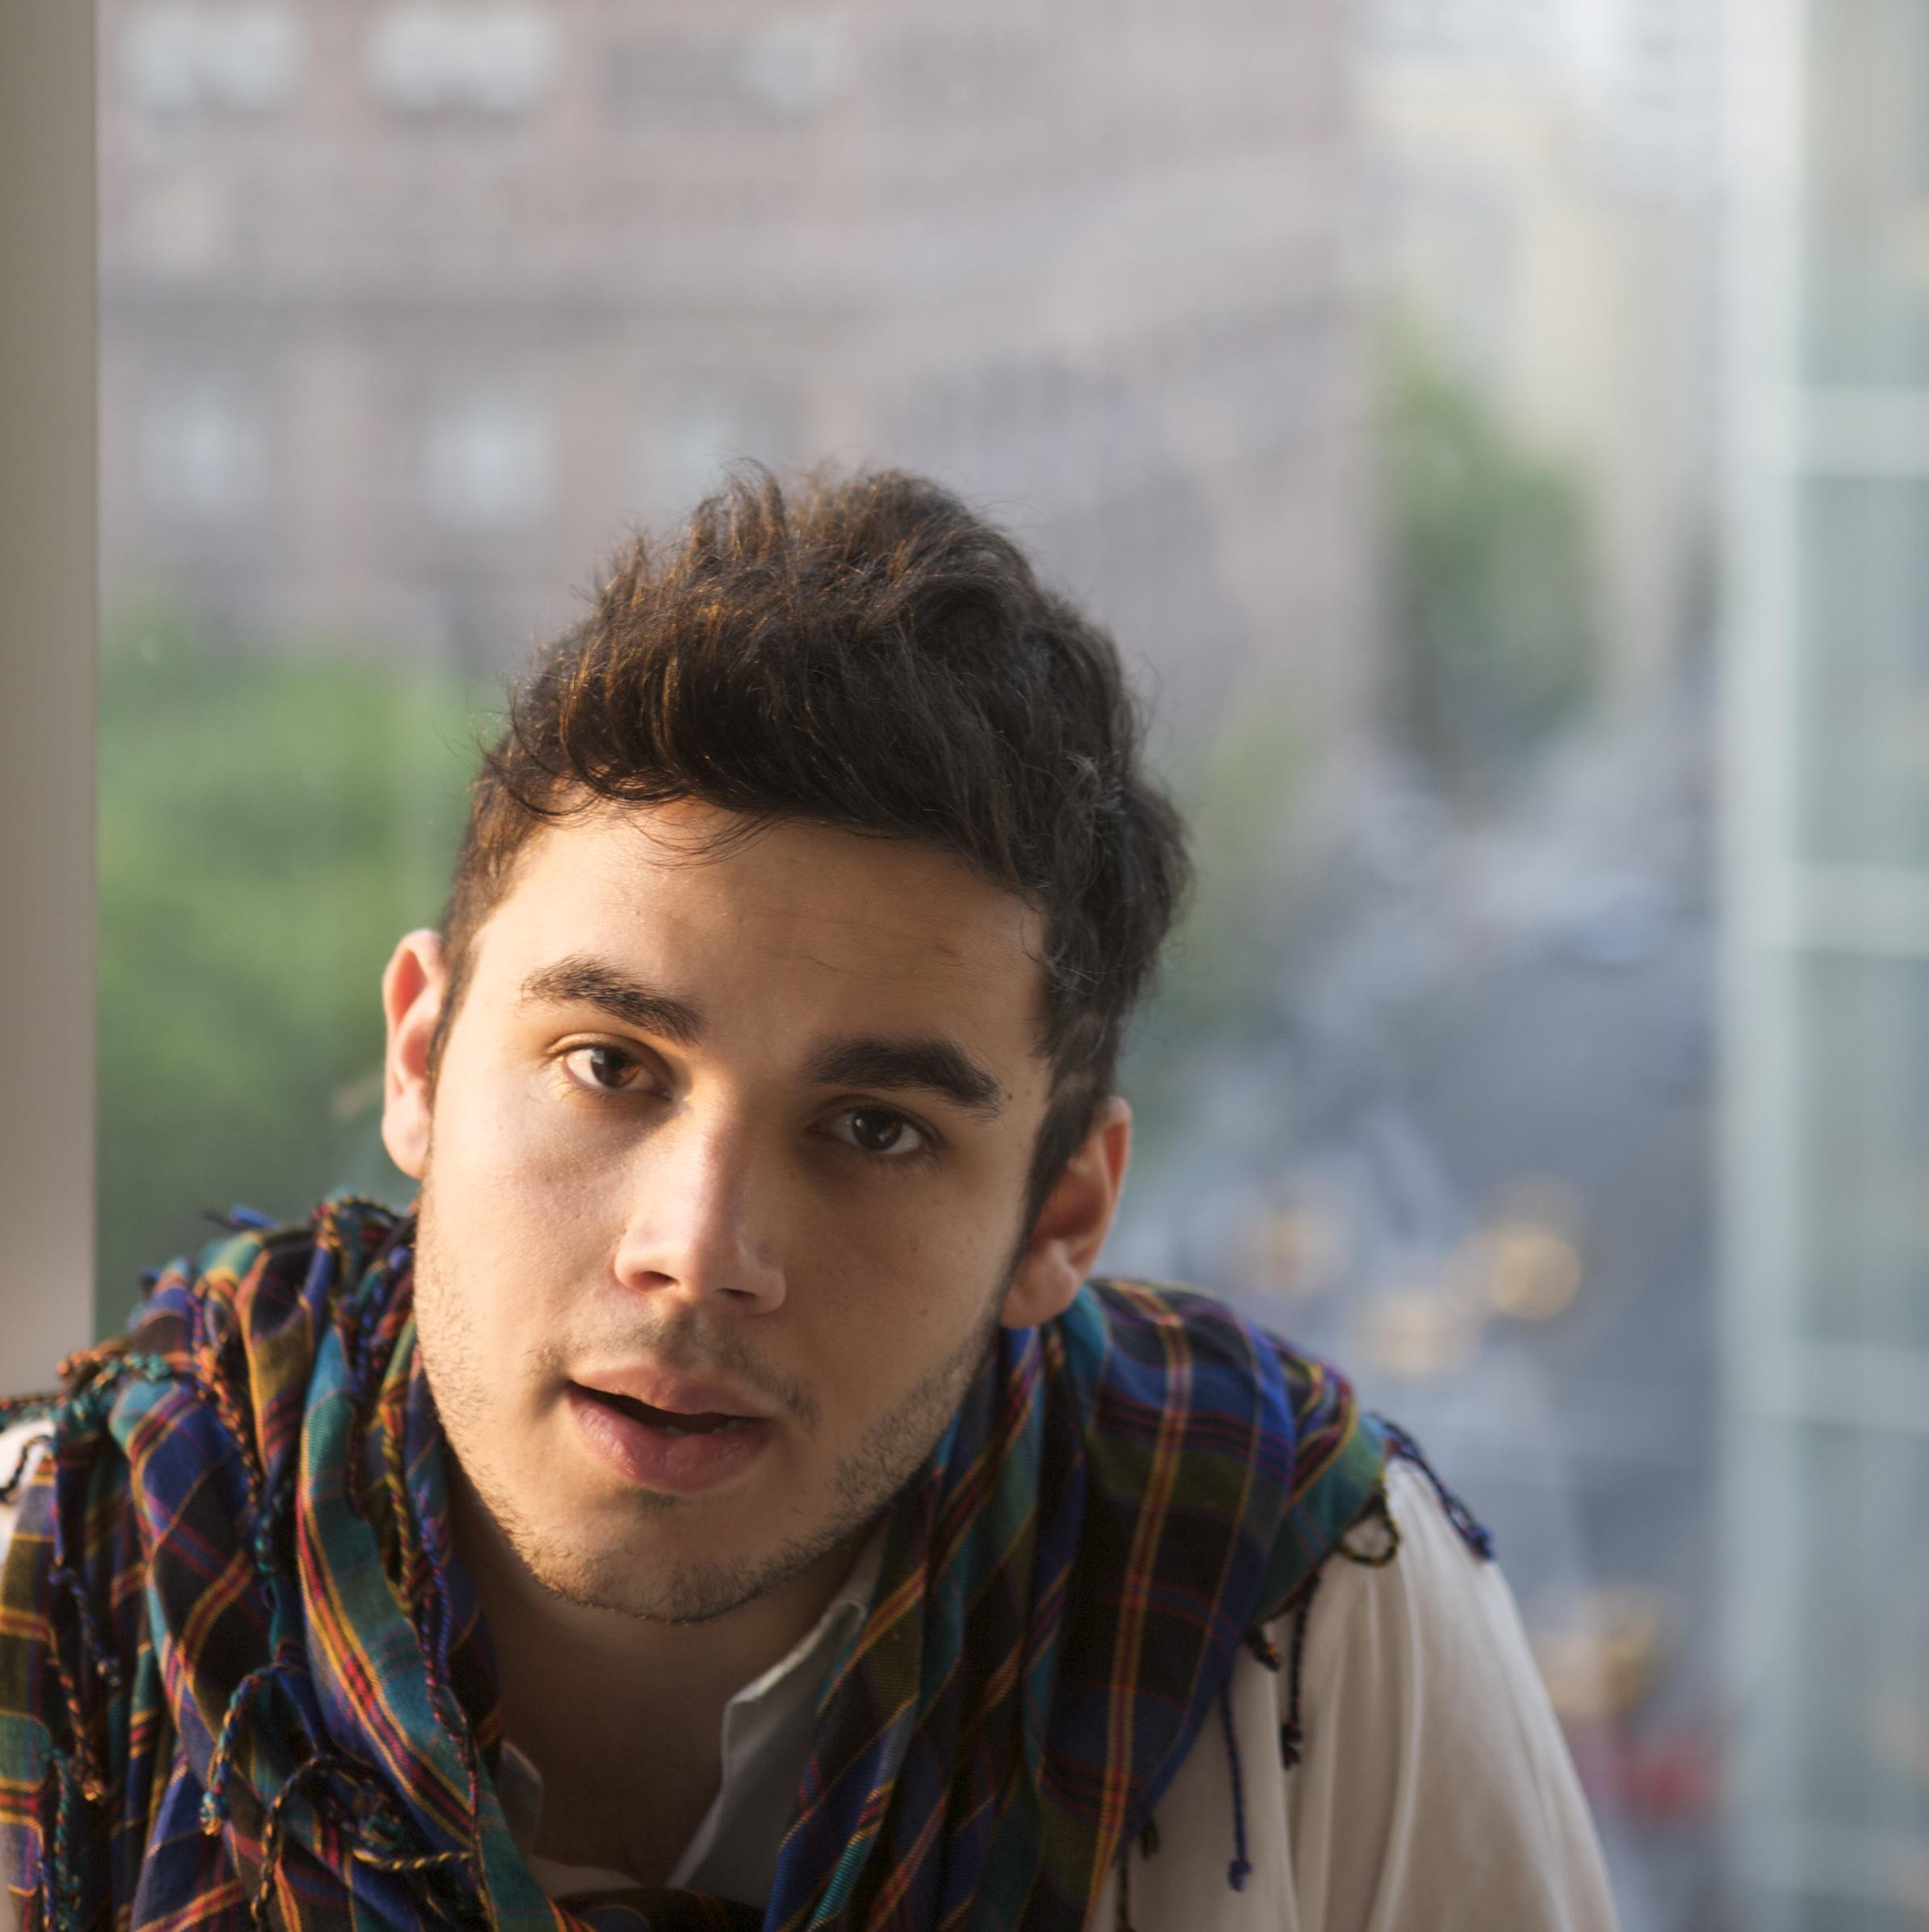 Rostam Batmanglij (openly gay member of Vampire Weekend)